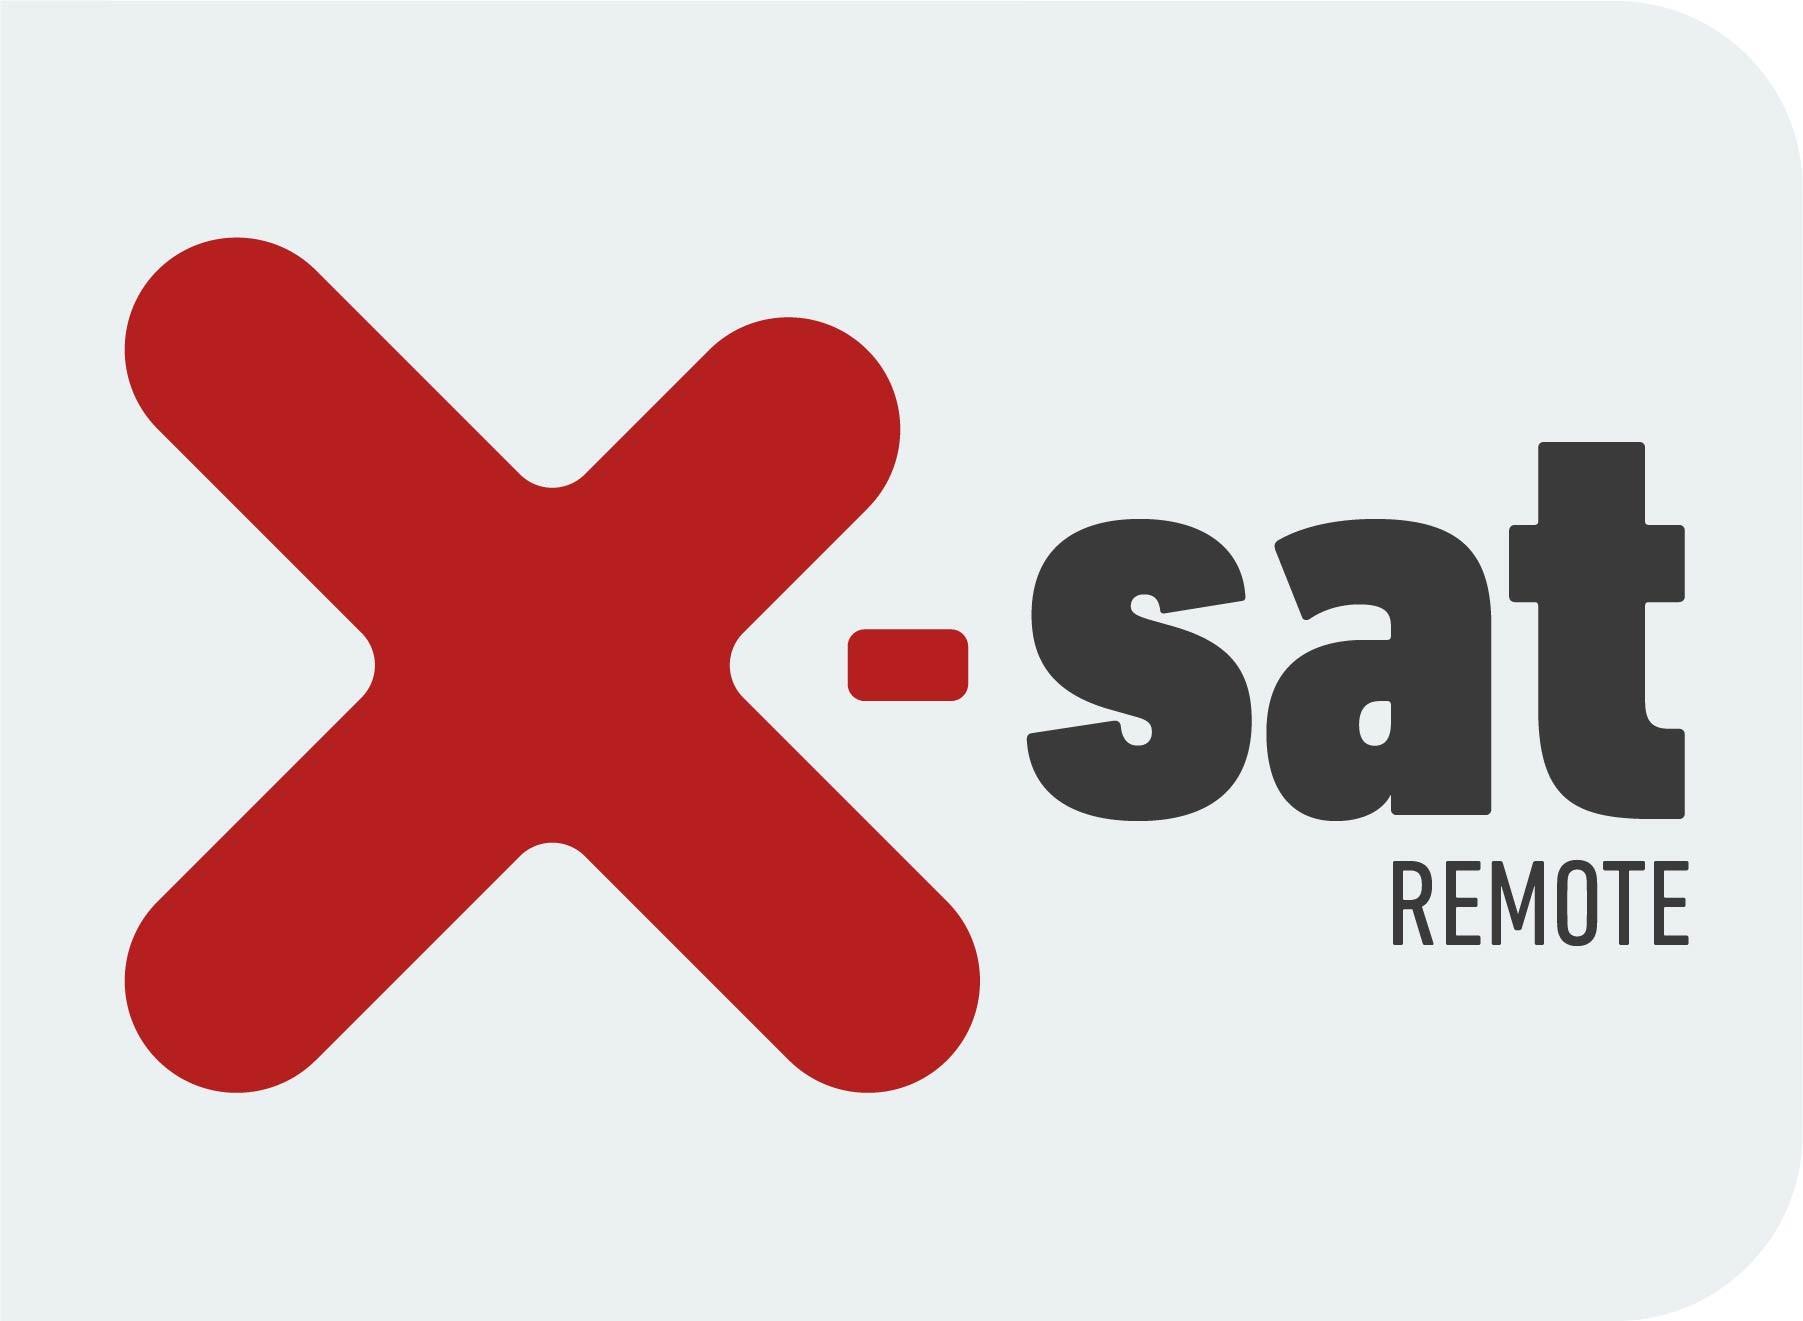 X SAT